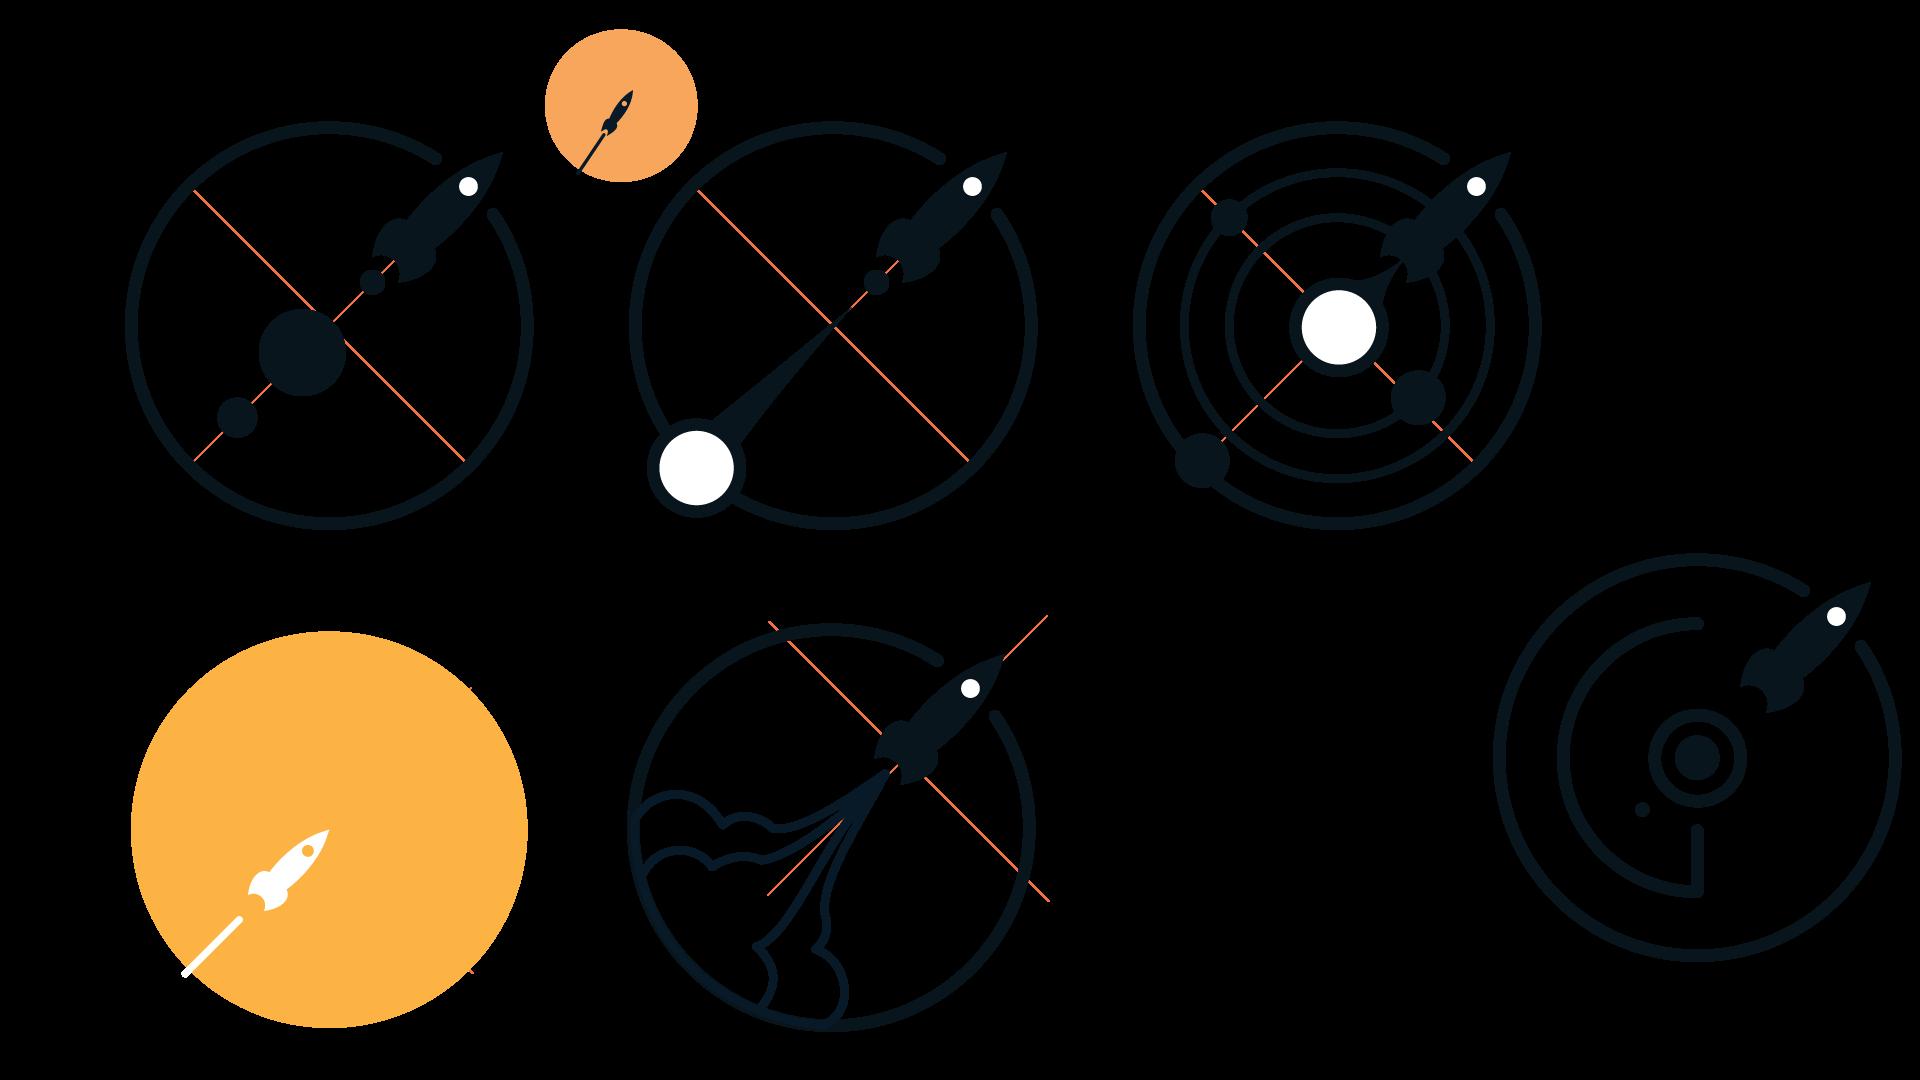 orbit-group3.png